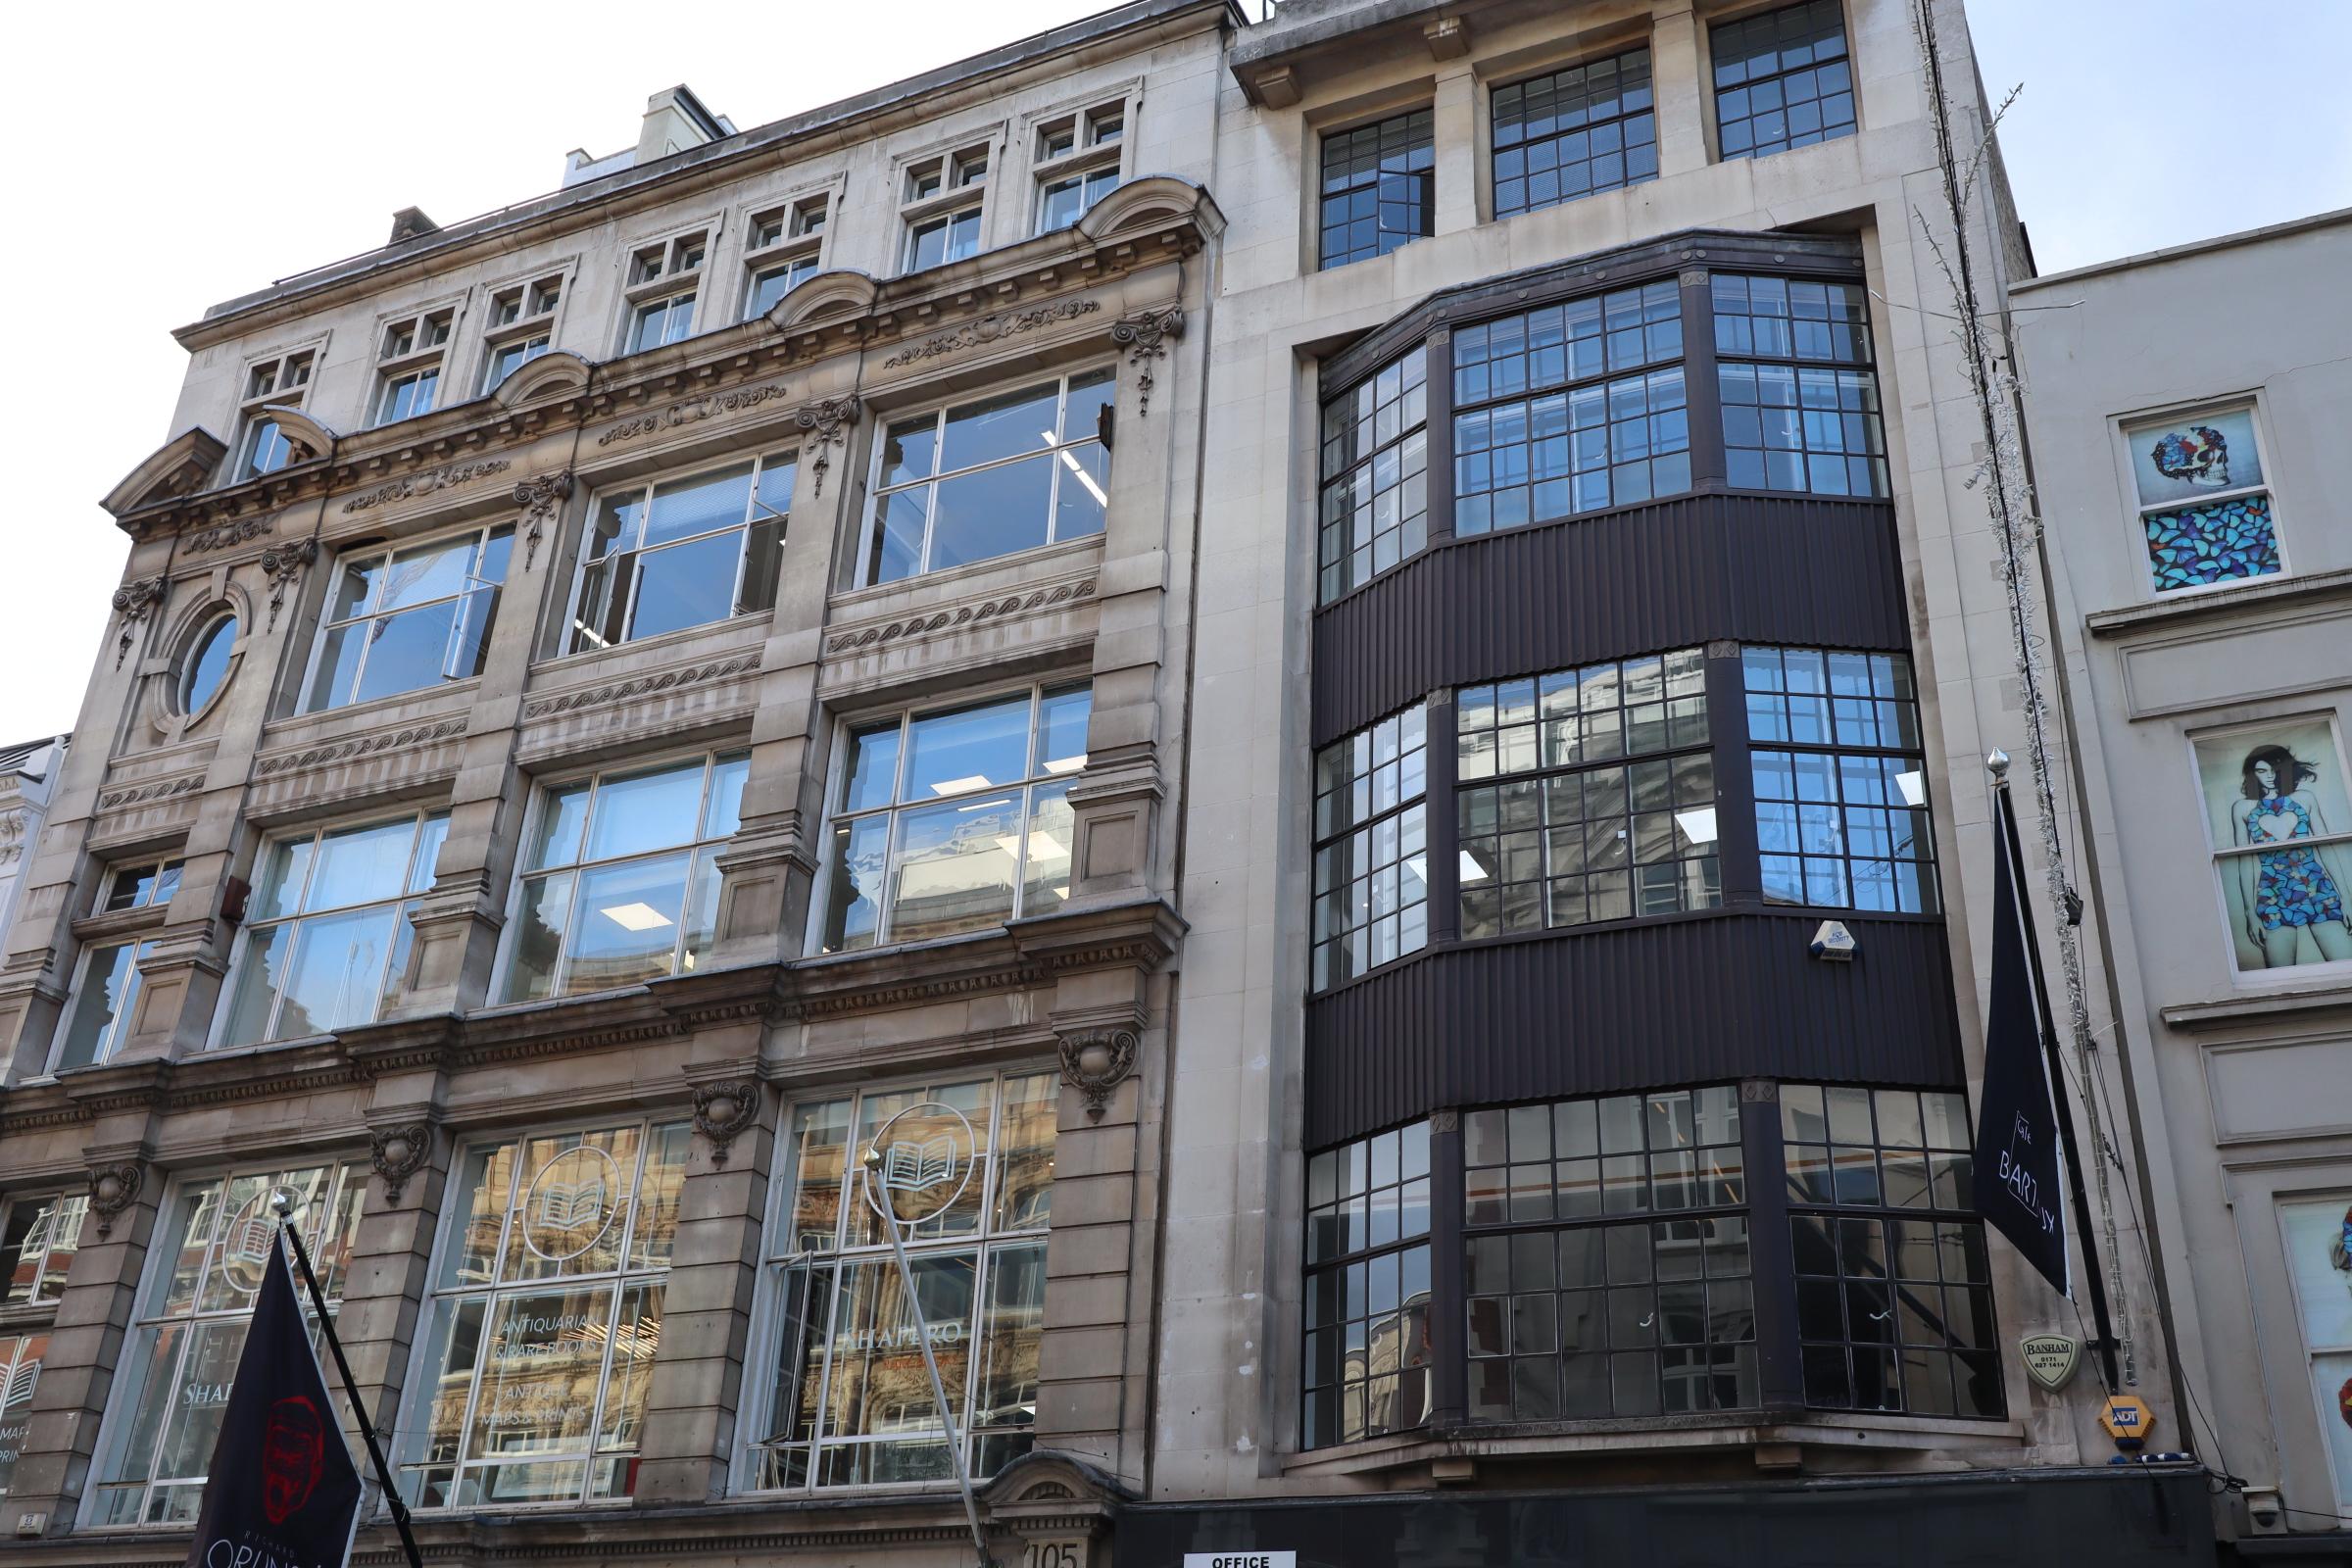 104 New Bond Street, Mayfair, London W1S 1SU